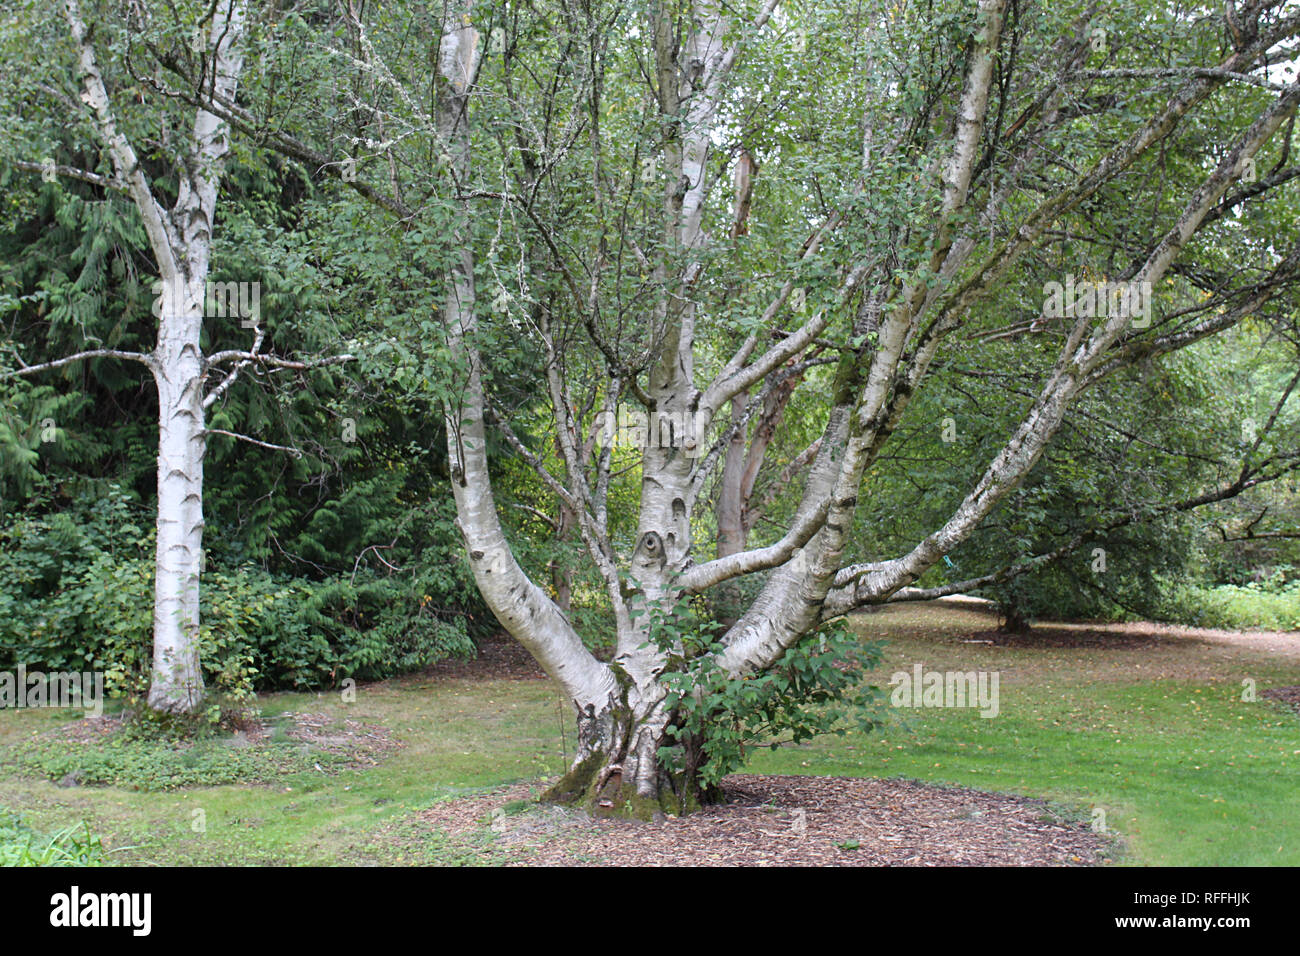 A sprawling birch tree growing in the Washington Park Arboretum in Seattle, Washington - Stock Image